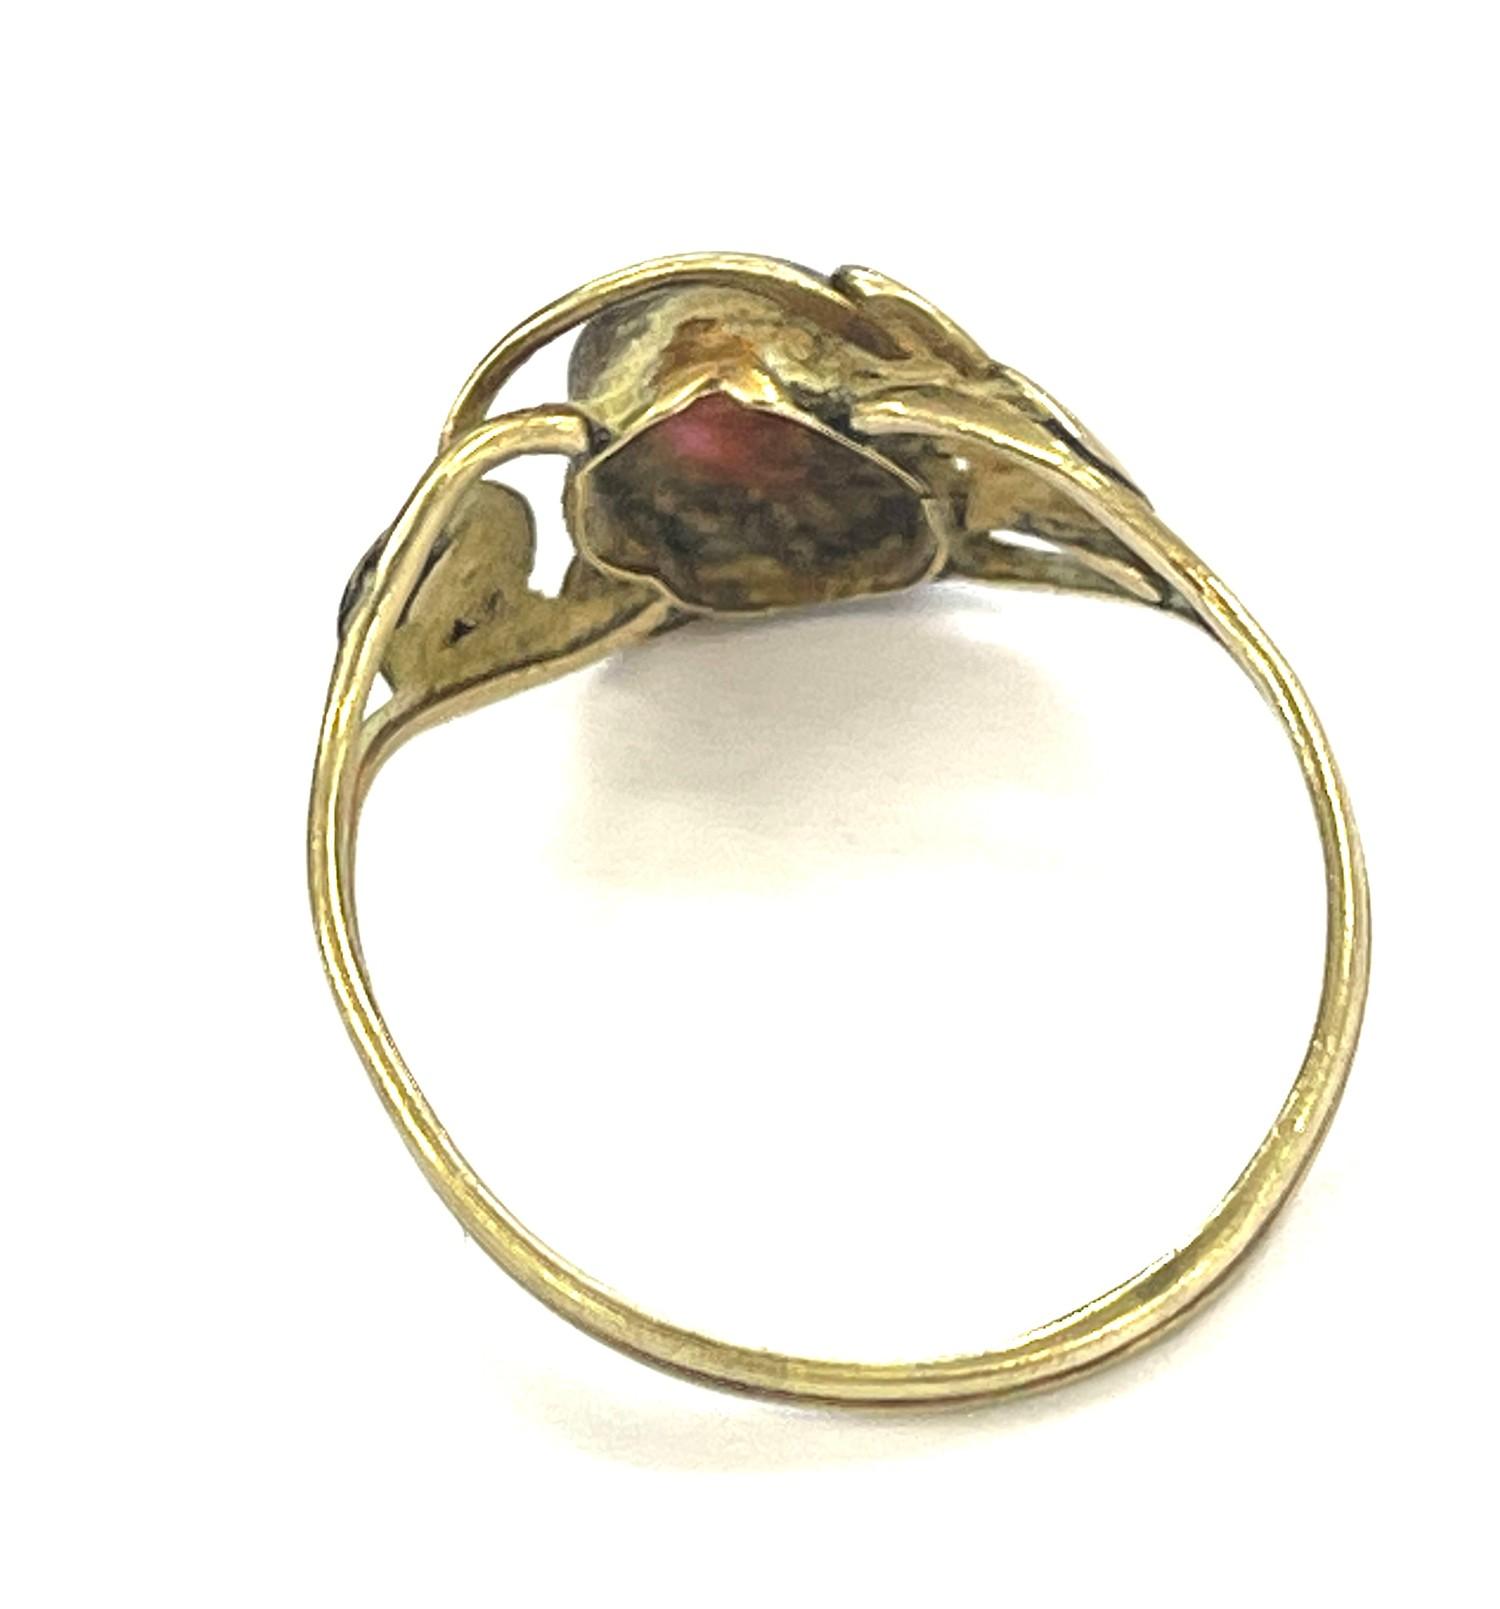 9ct Gold antique arts & crafts garnet ring - Image 2 of 3